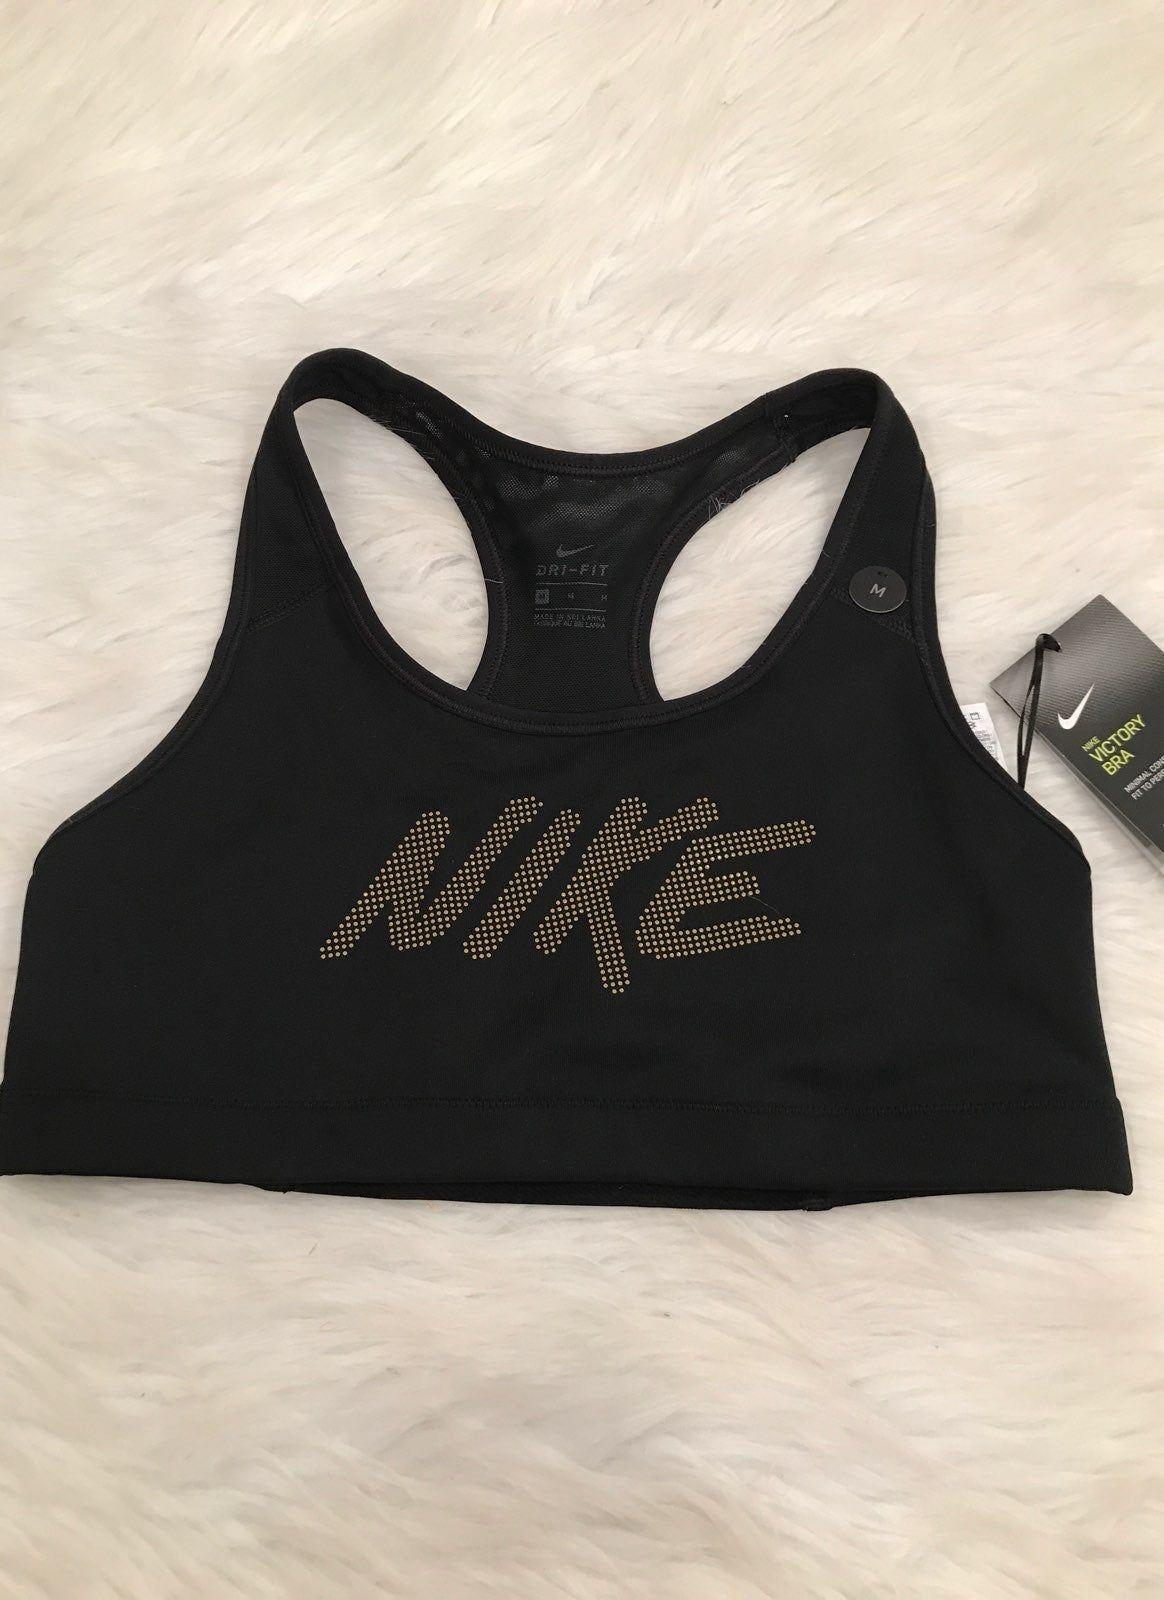 Medium Nike Sports Bra on Mercari Nike sports bra